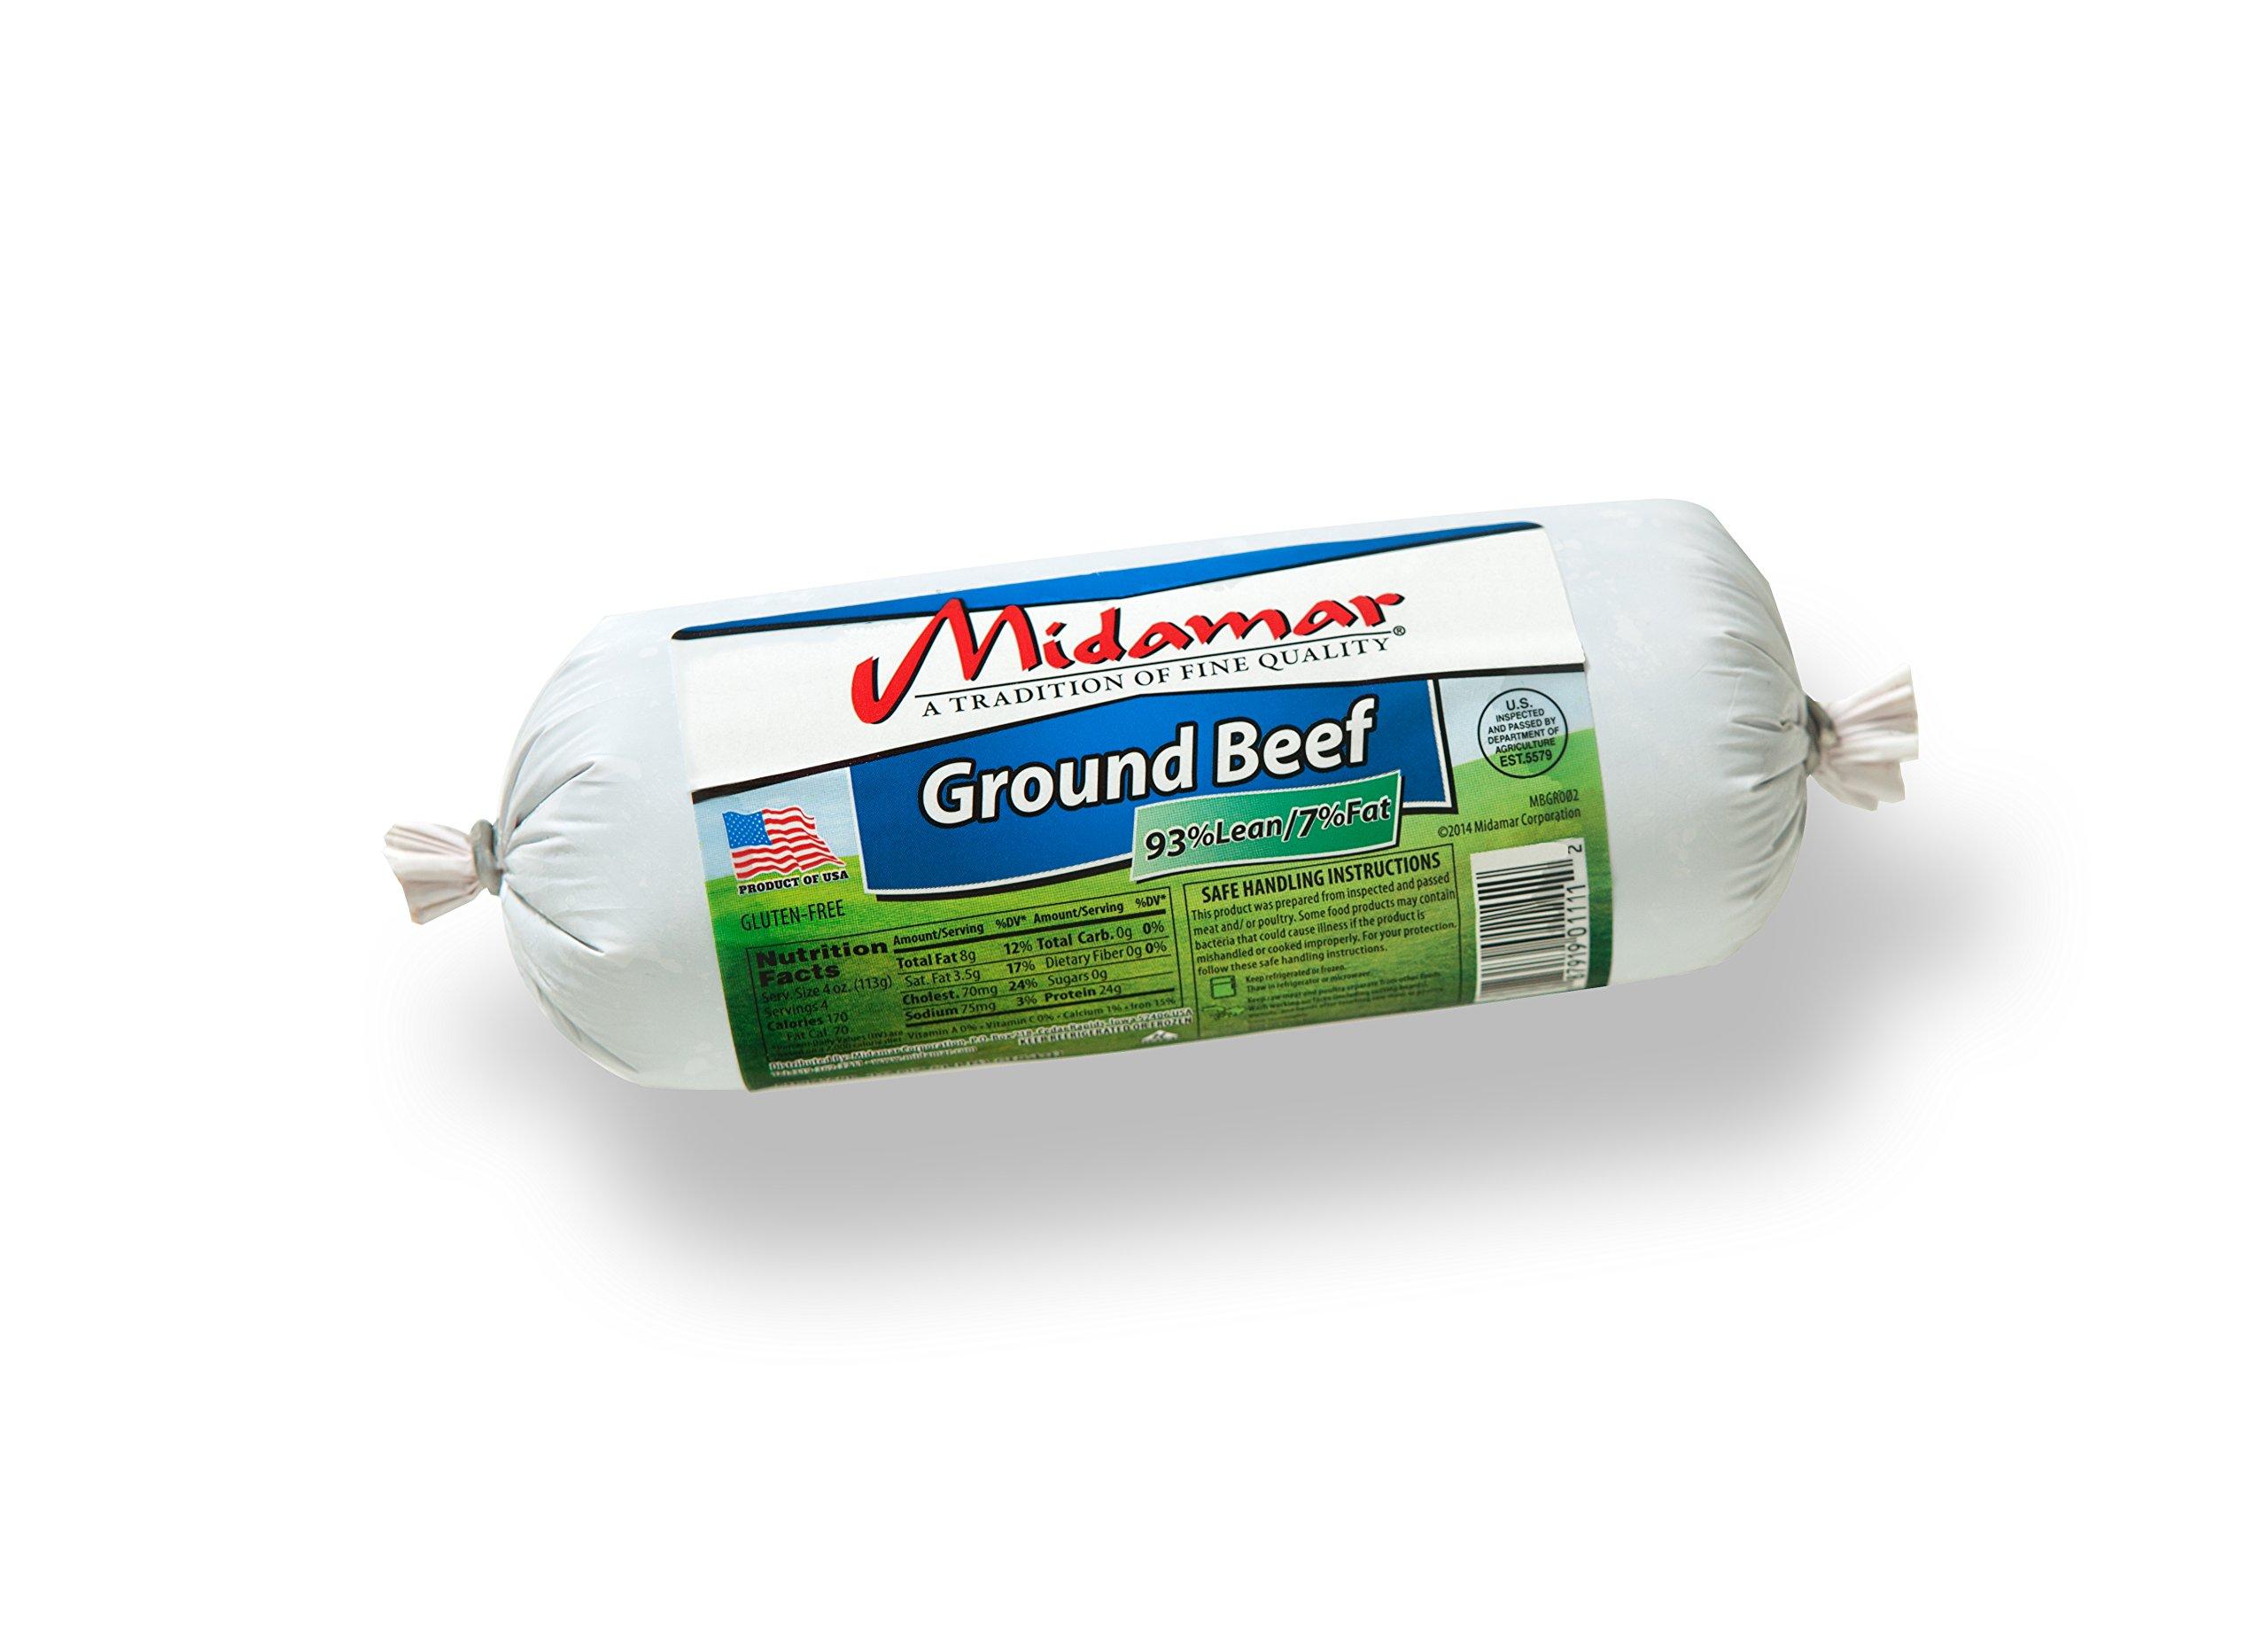 Midamar - Halal Pure Ground Beef (80% Lean) - 1 Case by Midamar